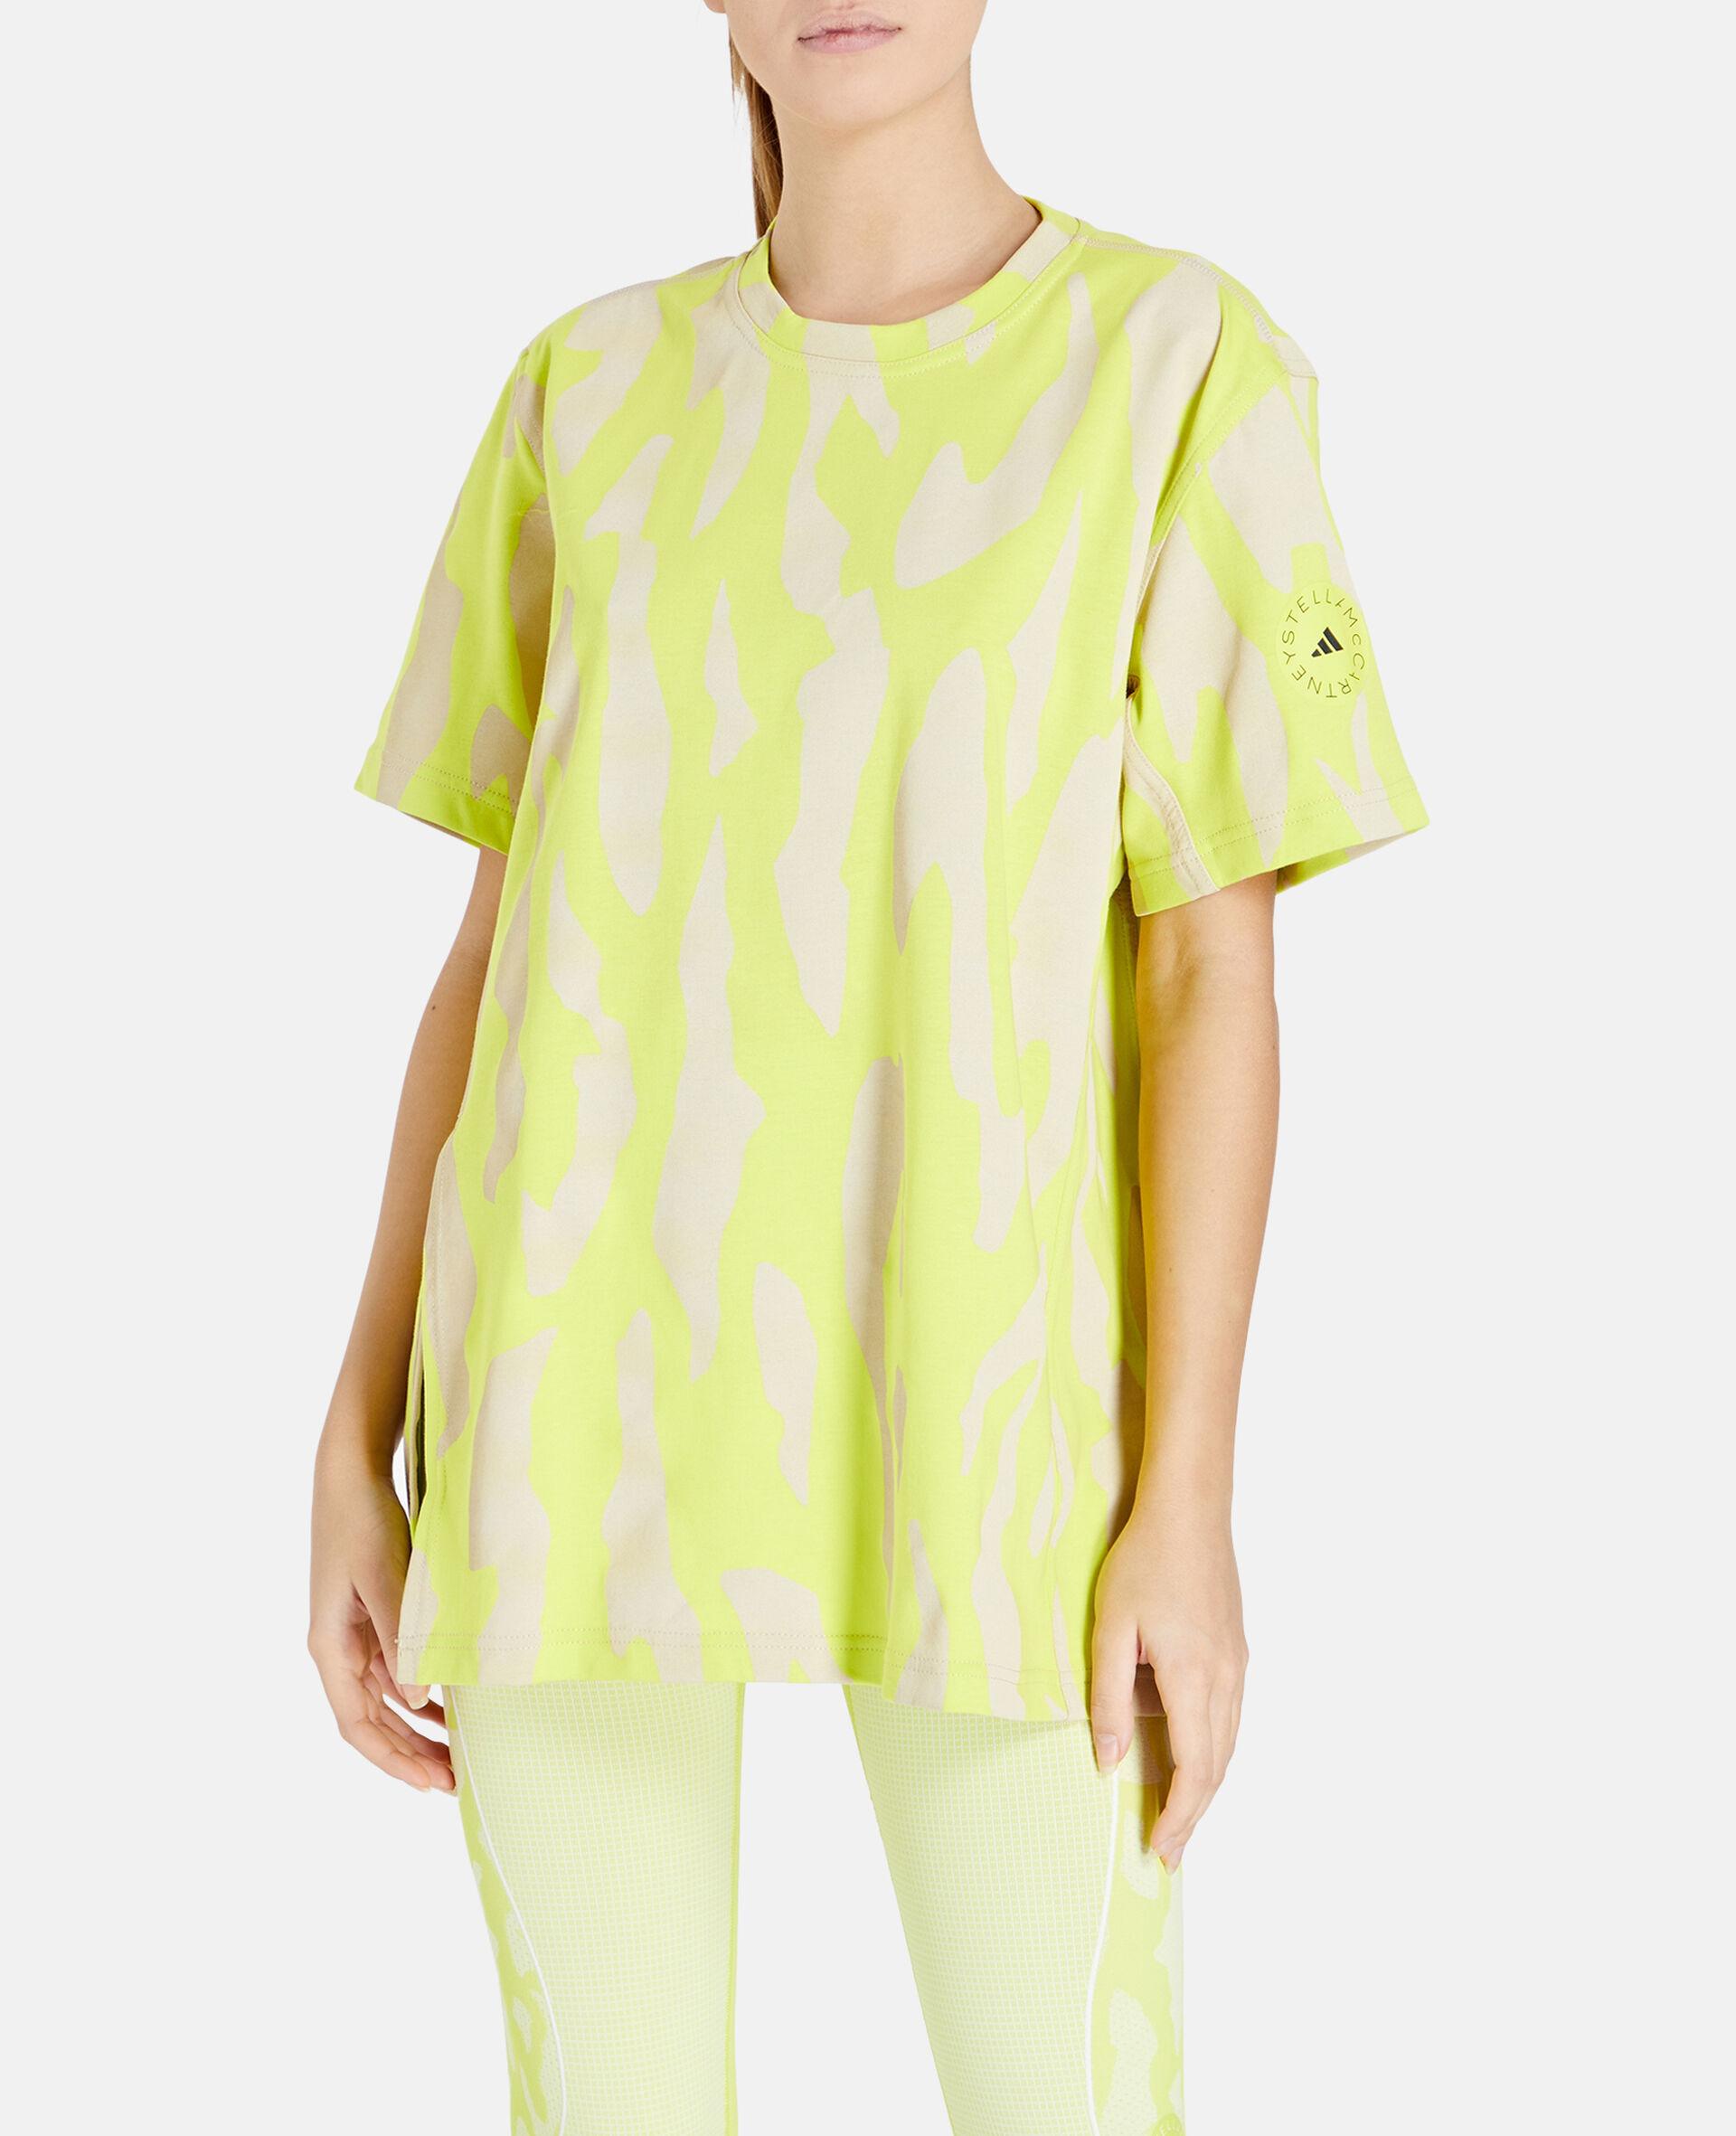 Future Playground T-Shirt-Gelb-large image number 4